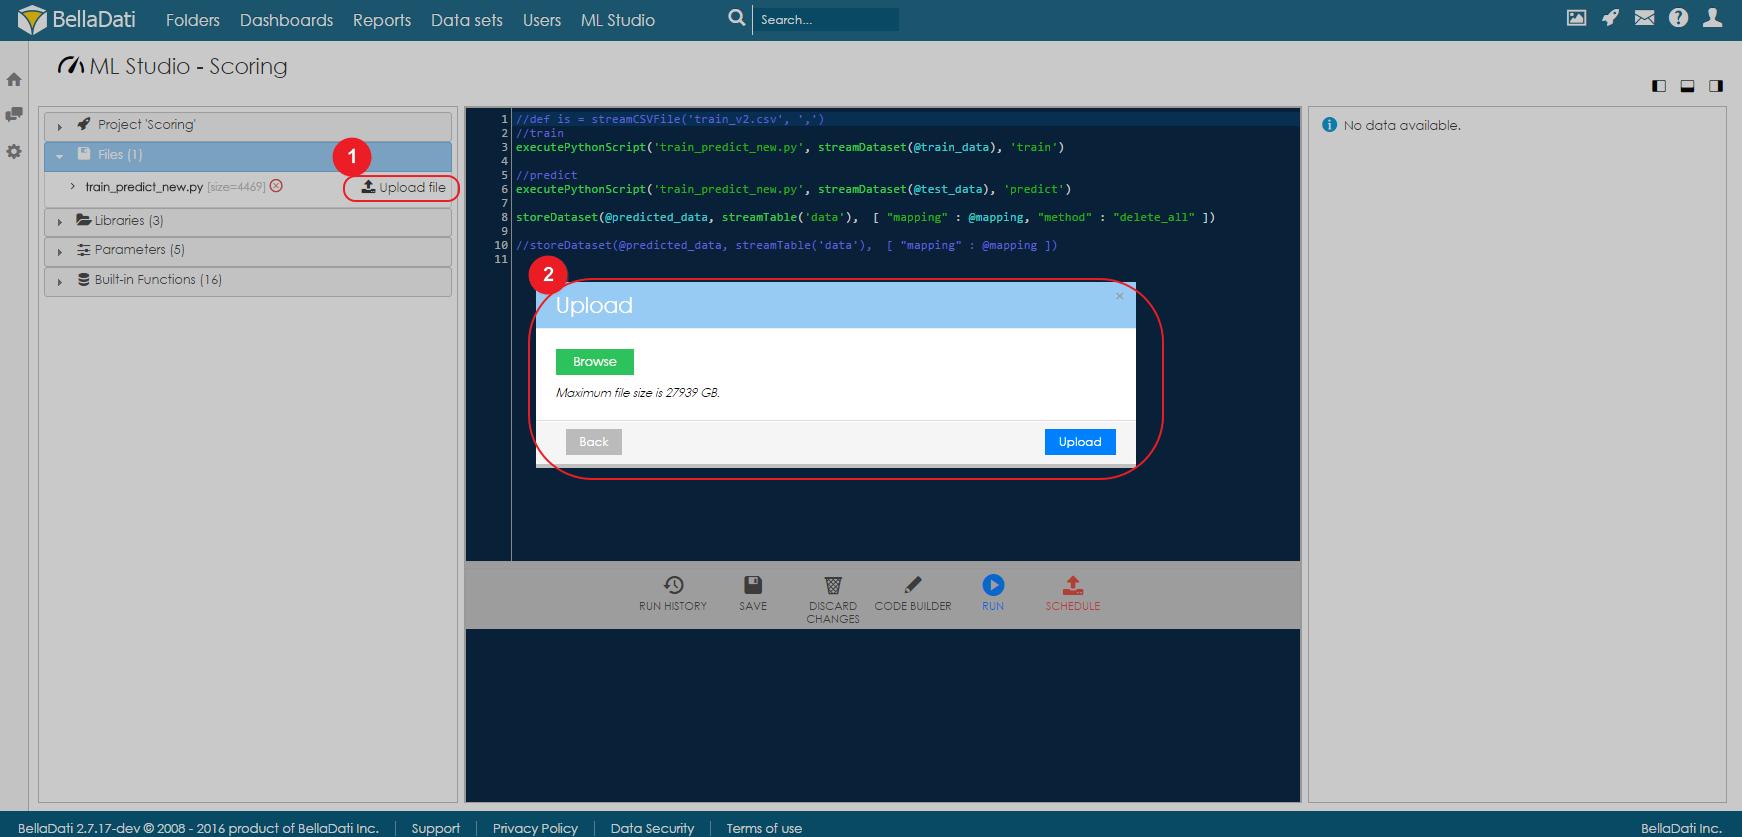 Using Python - BellaDati v2 7 - BellaDati Support